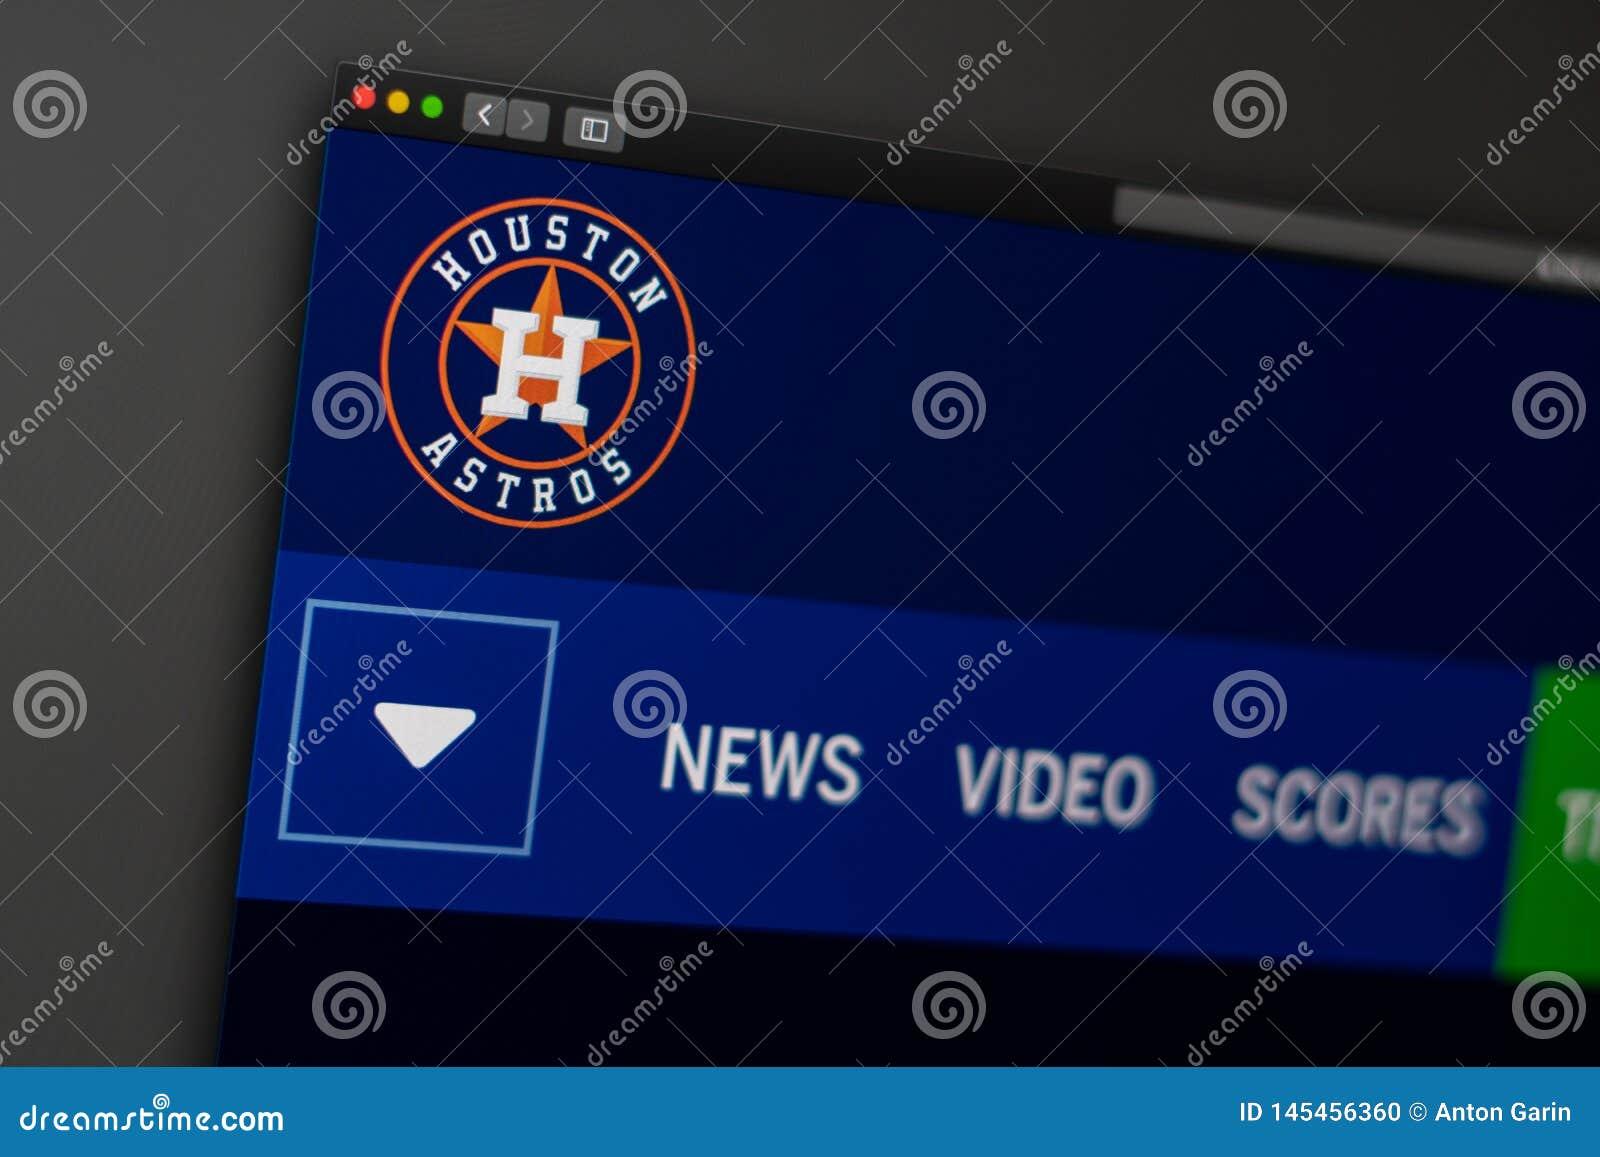 Baseball team Houston Astros website homepage. Close up of team logo.